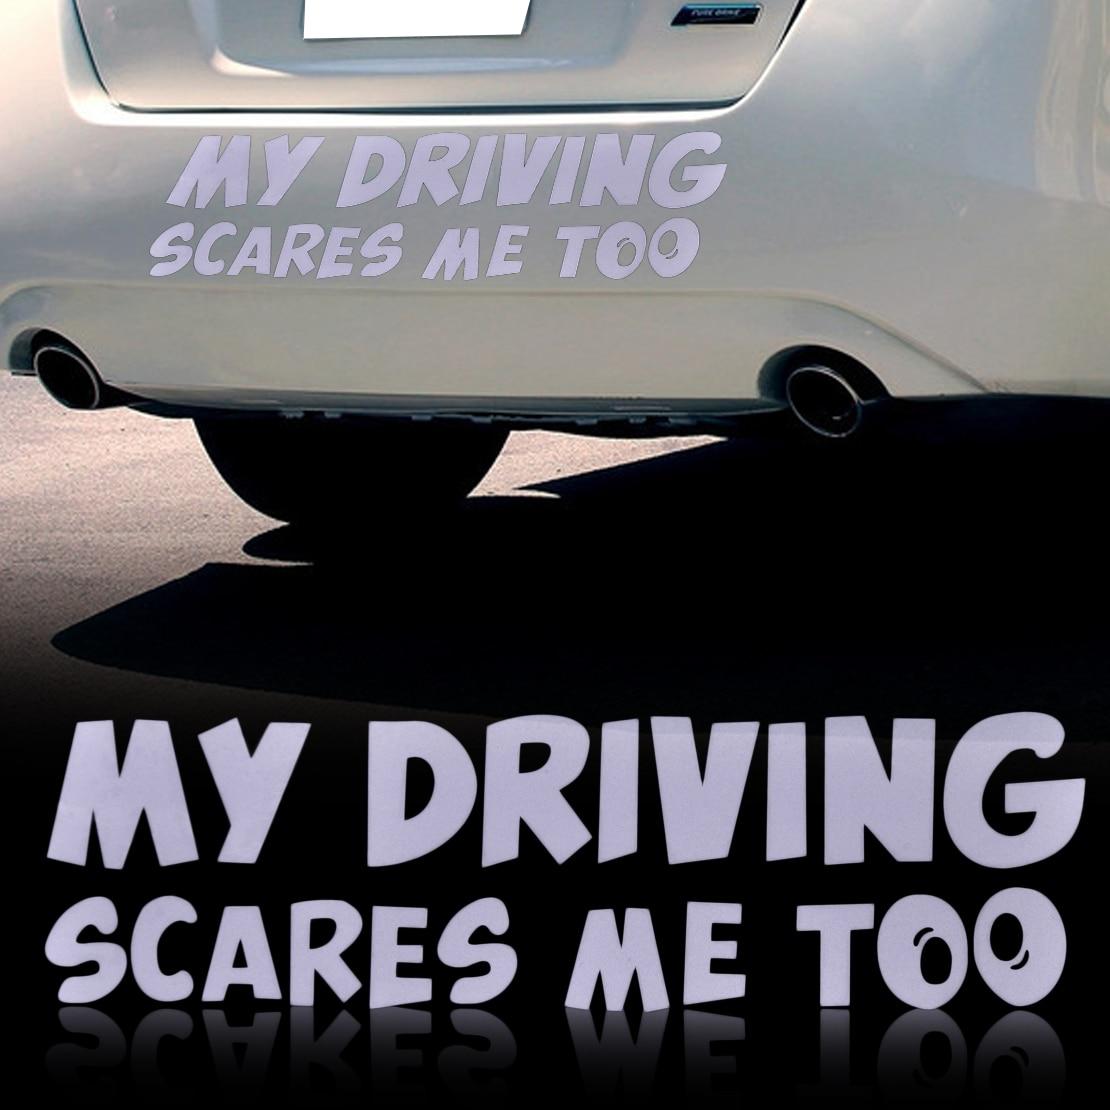 Toyota car sticker designs - Car Stickers My Driving Scares Me Too Window Bumper Van Custom Funny Vinyl Sticker Decals For